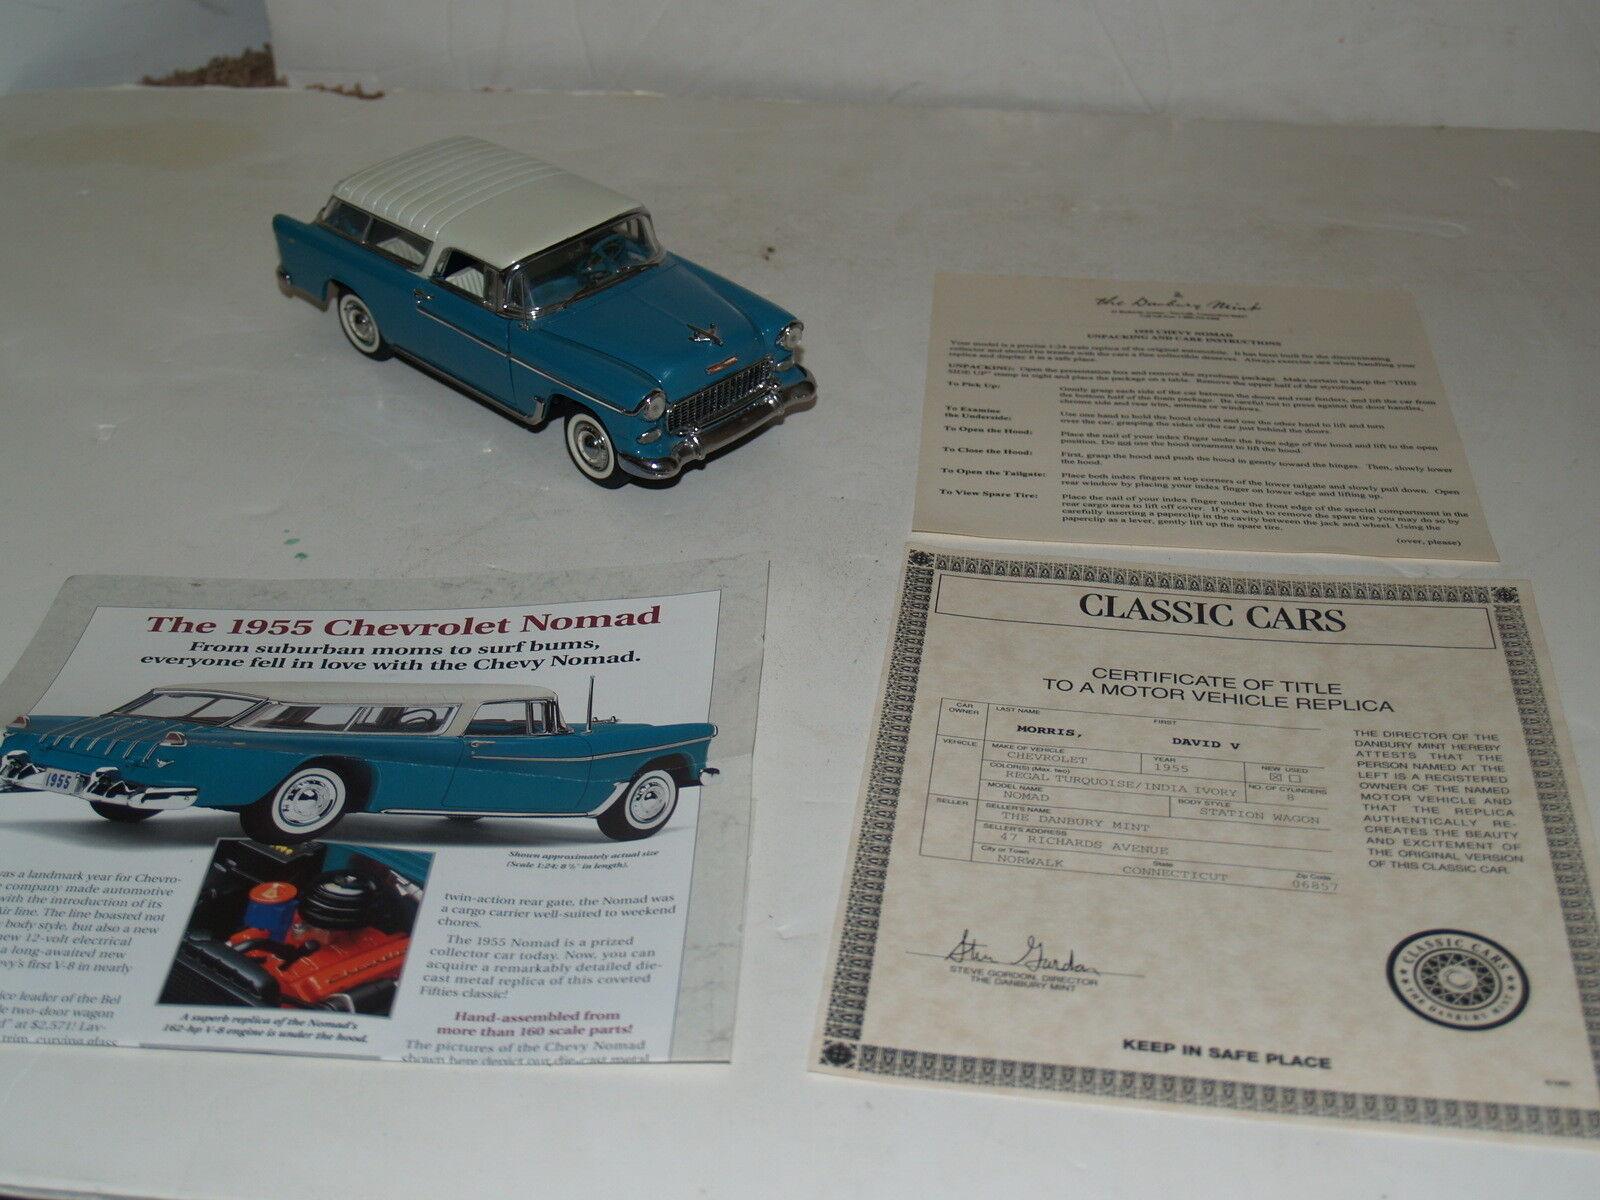 Danbury Mint-1955 Chevrolet Nomad-Turquoise Ivory Station Wagon-w title&Brochure